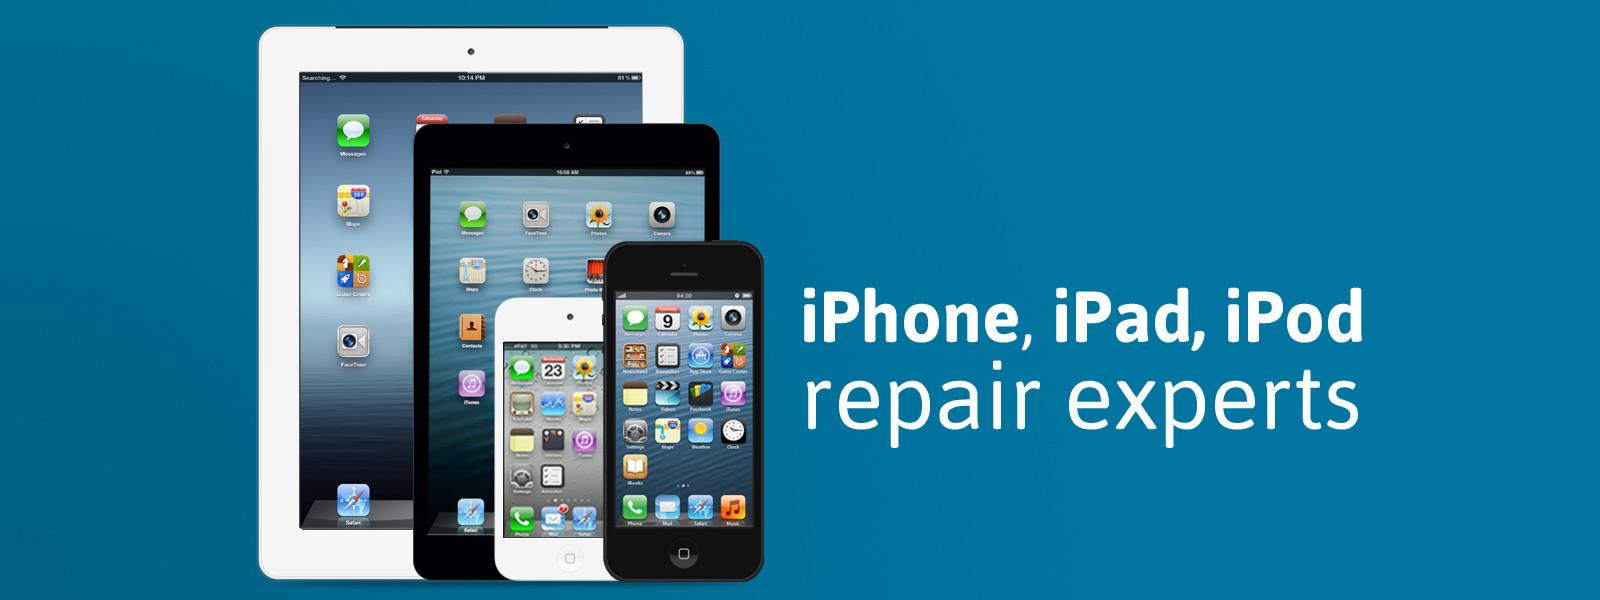 Cracked Screen Wallpaper Iphone 6 Iphone Ipod Ipad Repair Service Lakeland Fl Iphone